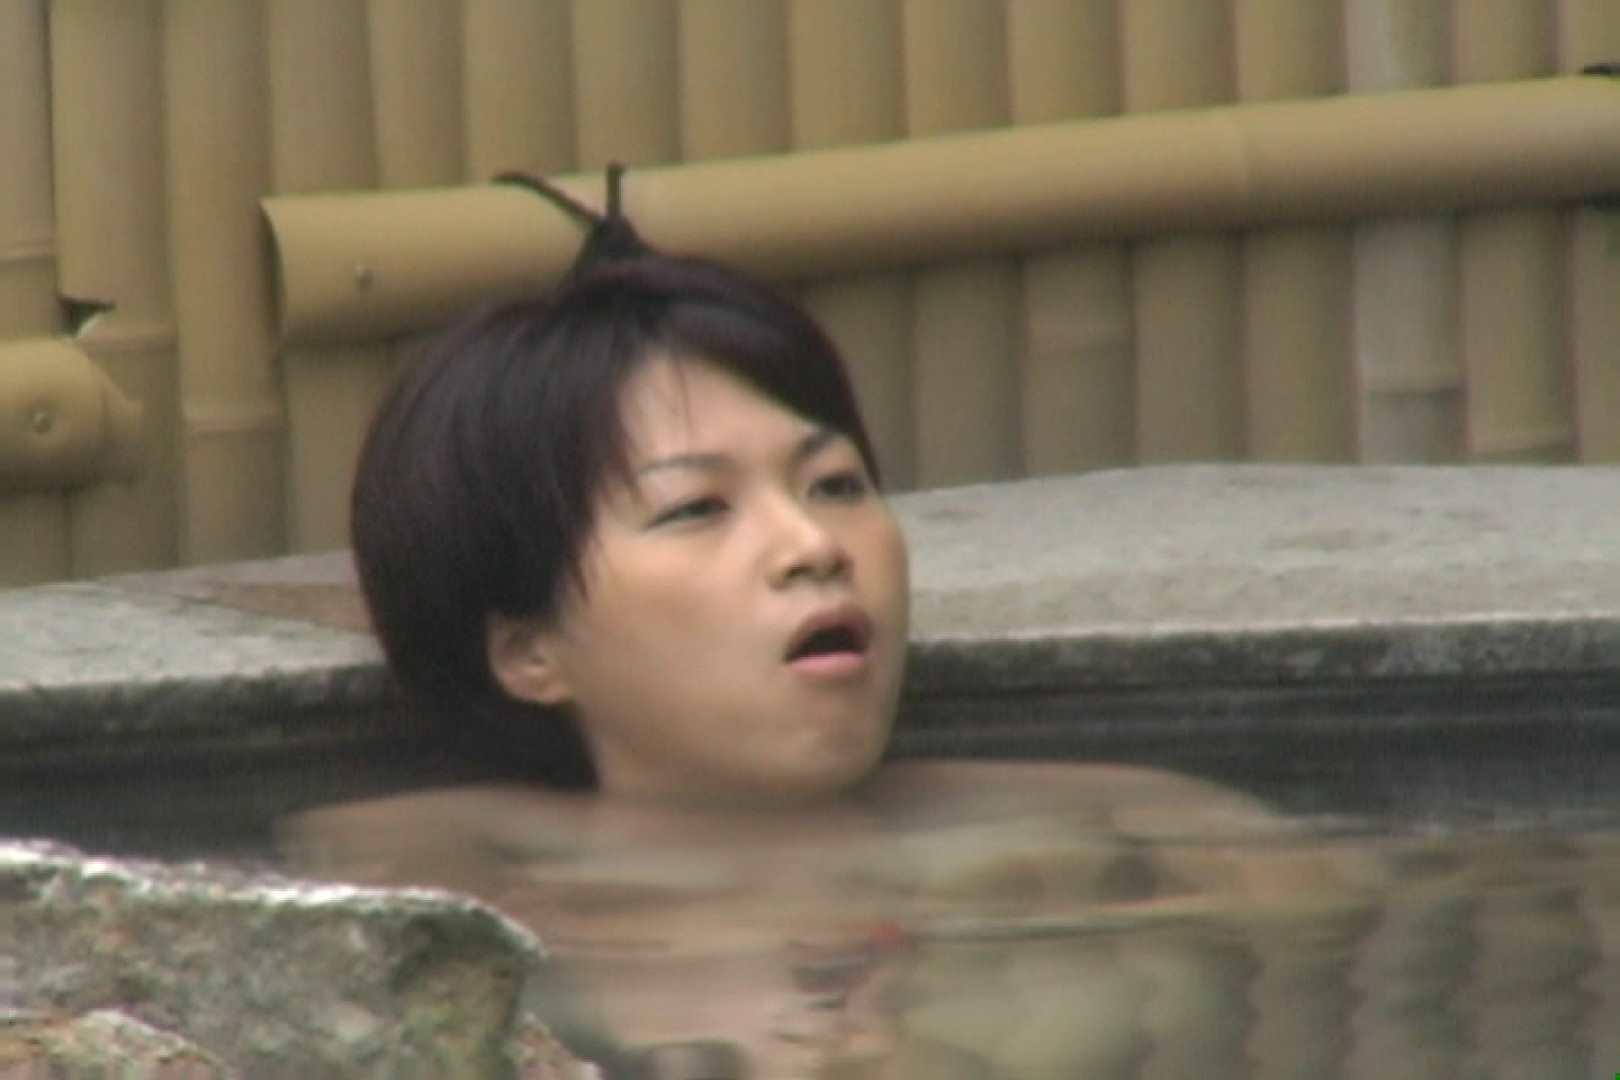 Aquaな露天風呂Vol.624 露天風呂編  88PIX 4